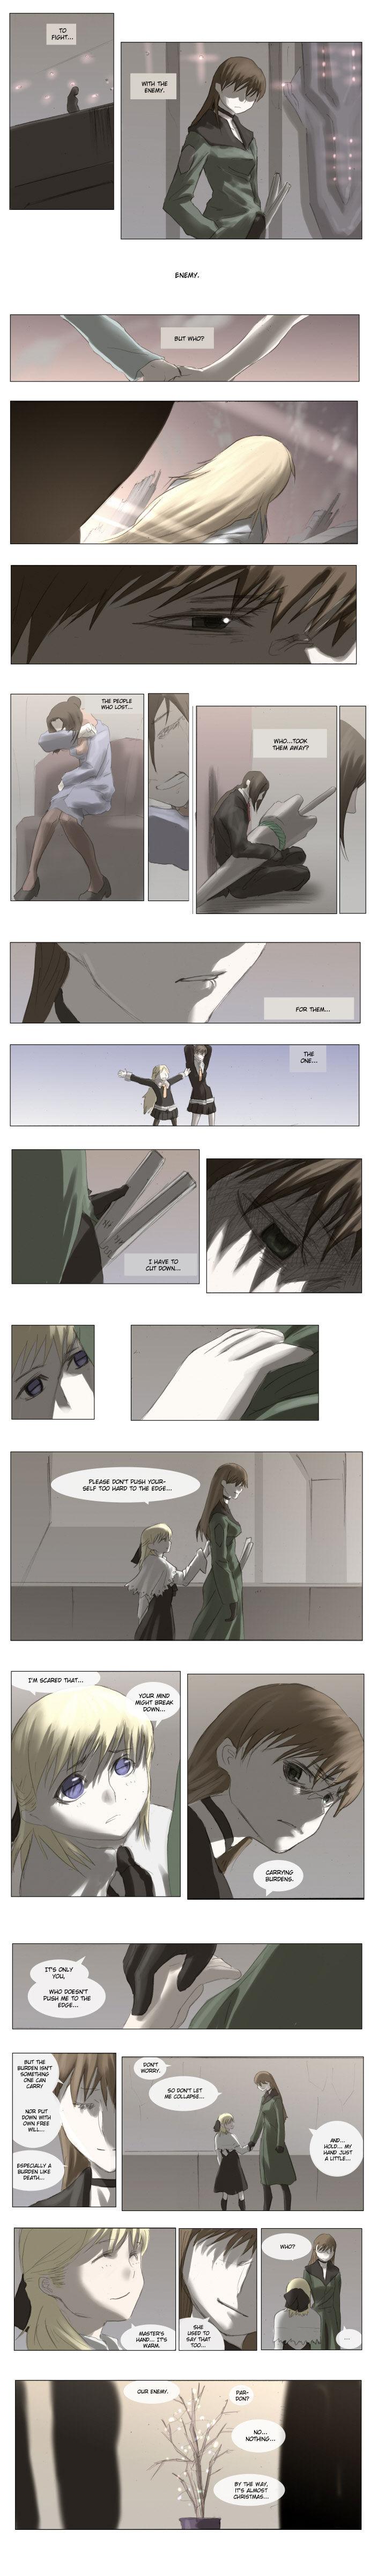 Knight Run 44 Page 3